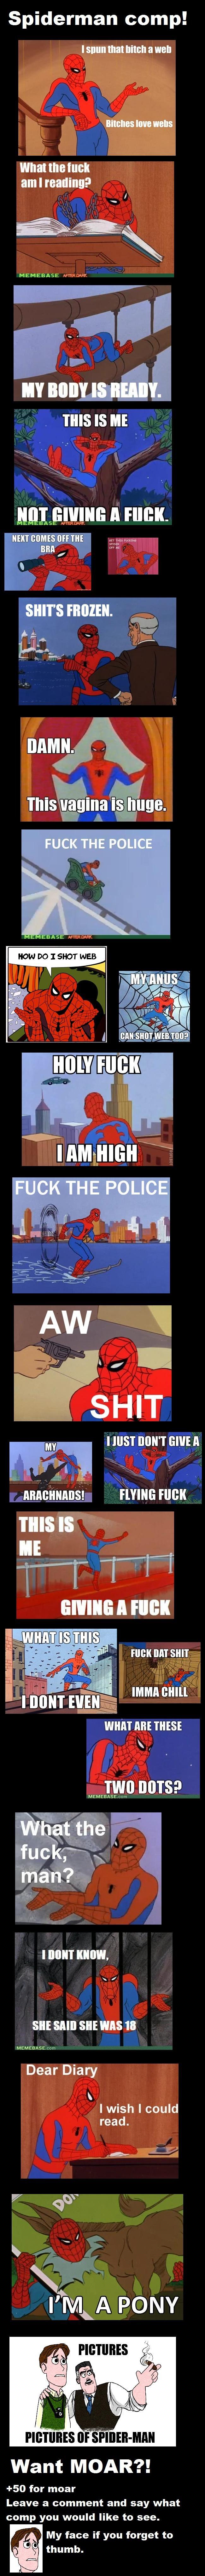 "80's Spiderman comp. . Spiderman comp.' mun am I reading? MEMEBASE rum! THIS IS ME I A ite' THIS IS ruck mun we want an ms: TIMI} INNS? MEMEBASE com I III!"" KIW 80's Spiderman comp ' mun am I reading? MEMEBASE rum! THIS IS ME A ite' ruck we want an ms: TIMI} INNS? com III!"" KIW"